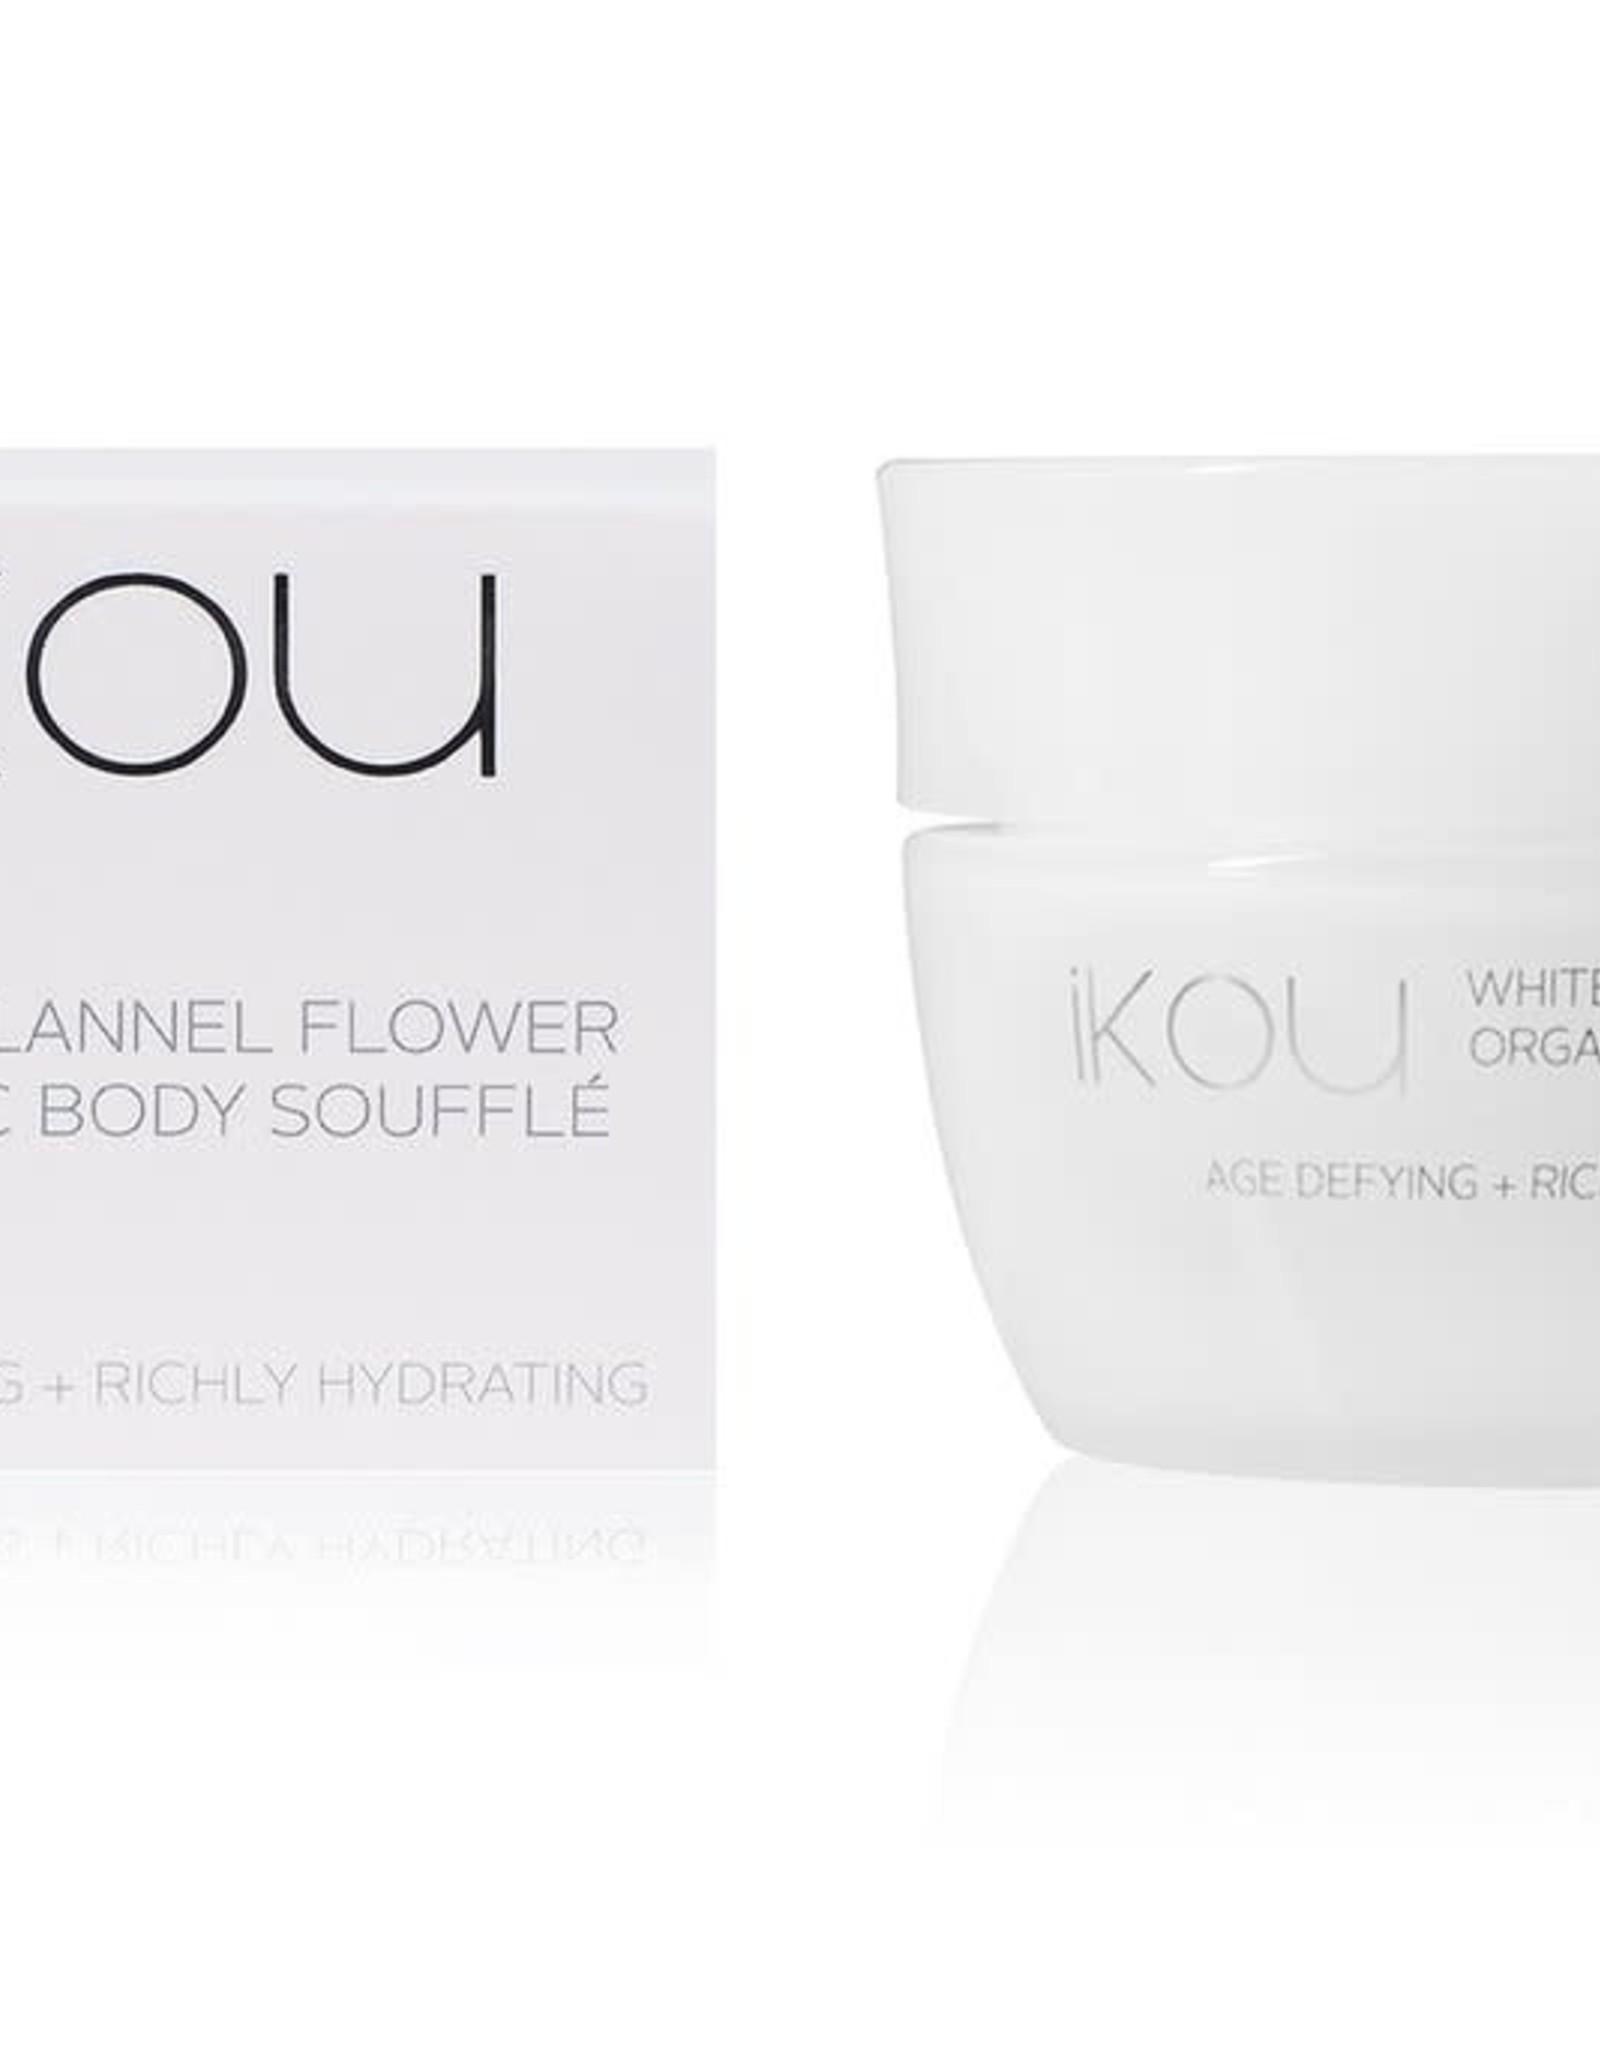 IKOU White Flannel Flower Age-Defying Body Souffle